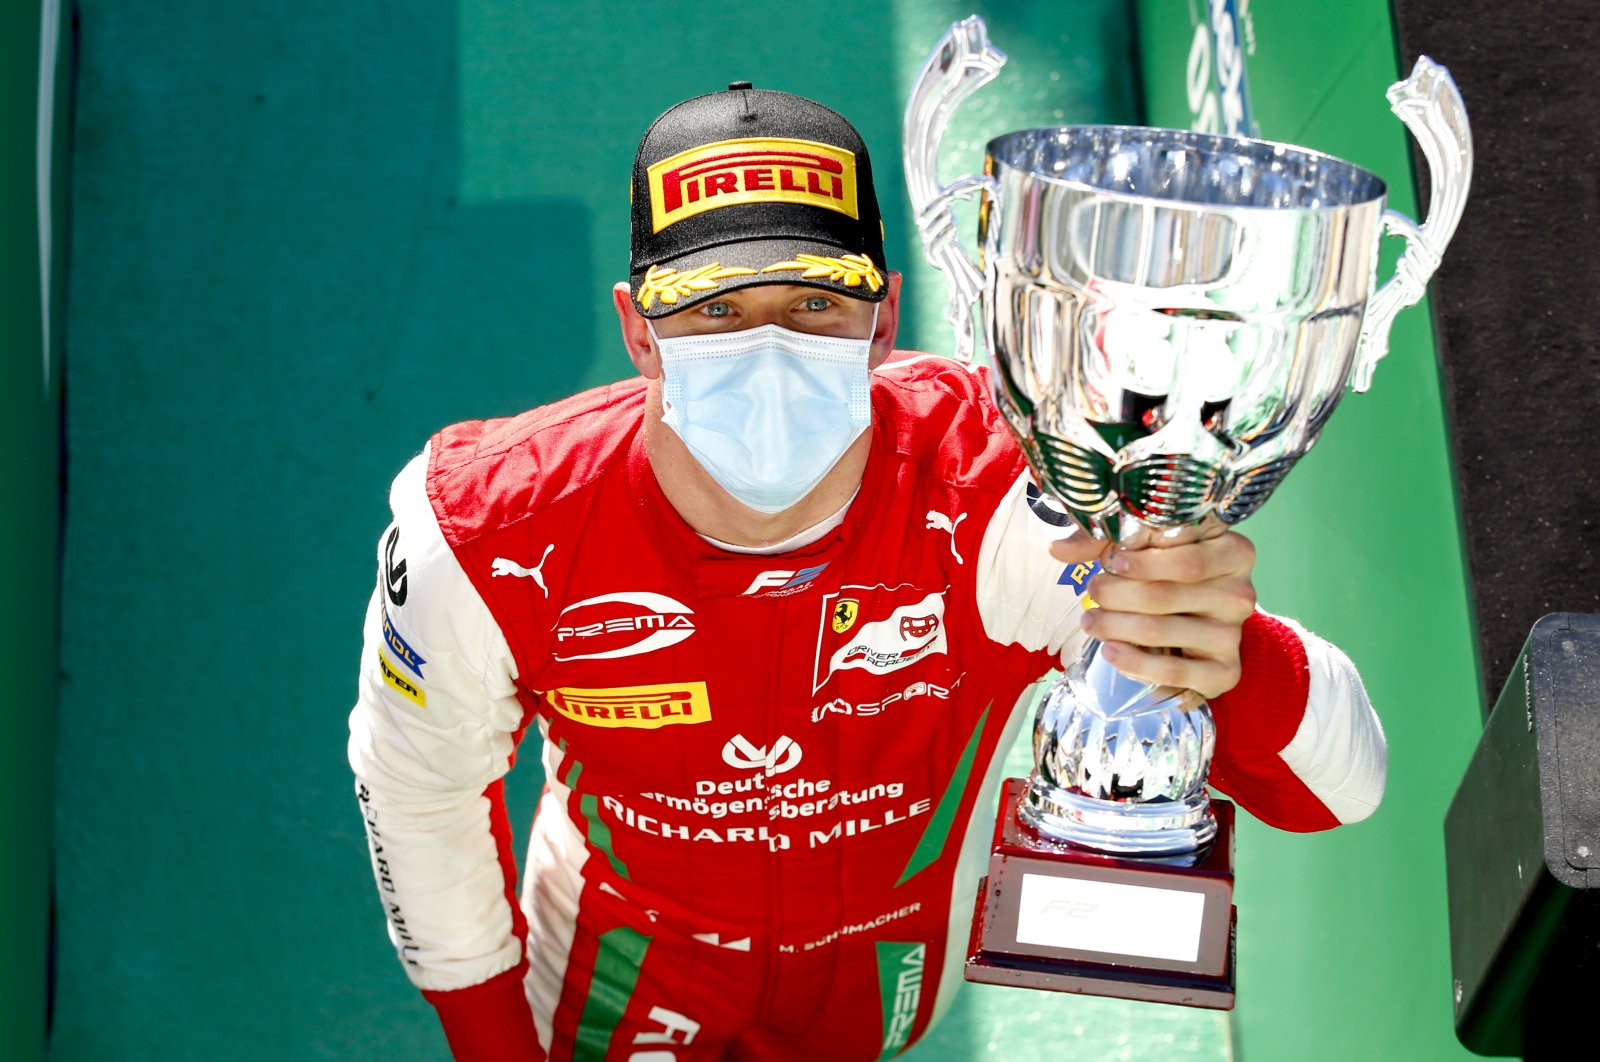 Mick Schumacher celebrates winning the Formula 2 race in Monza, Italy, Sept. 5, 2020. (Reuters Photo)